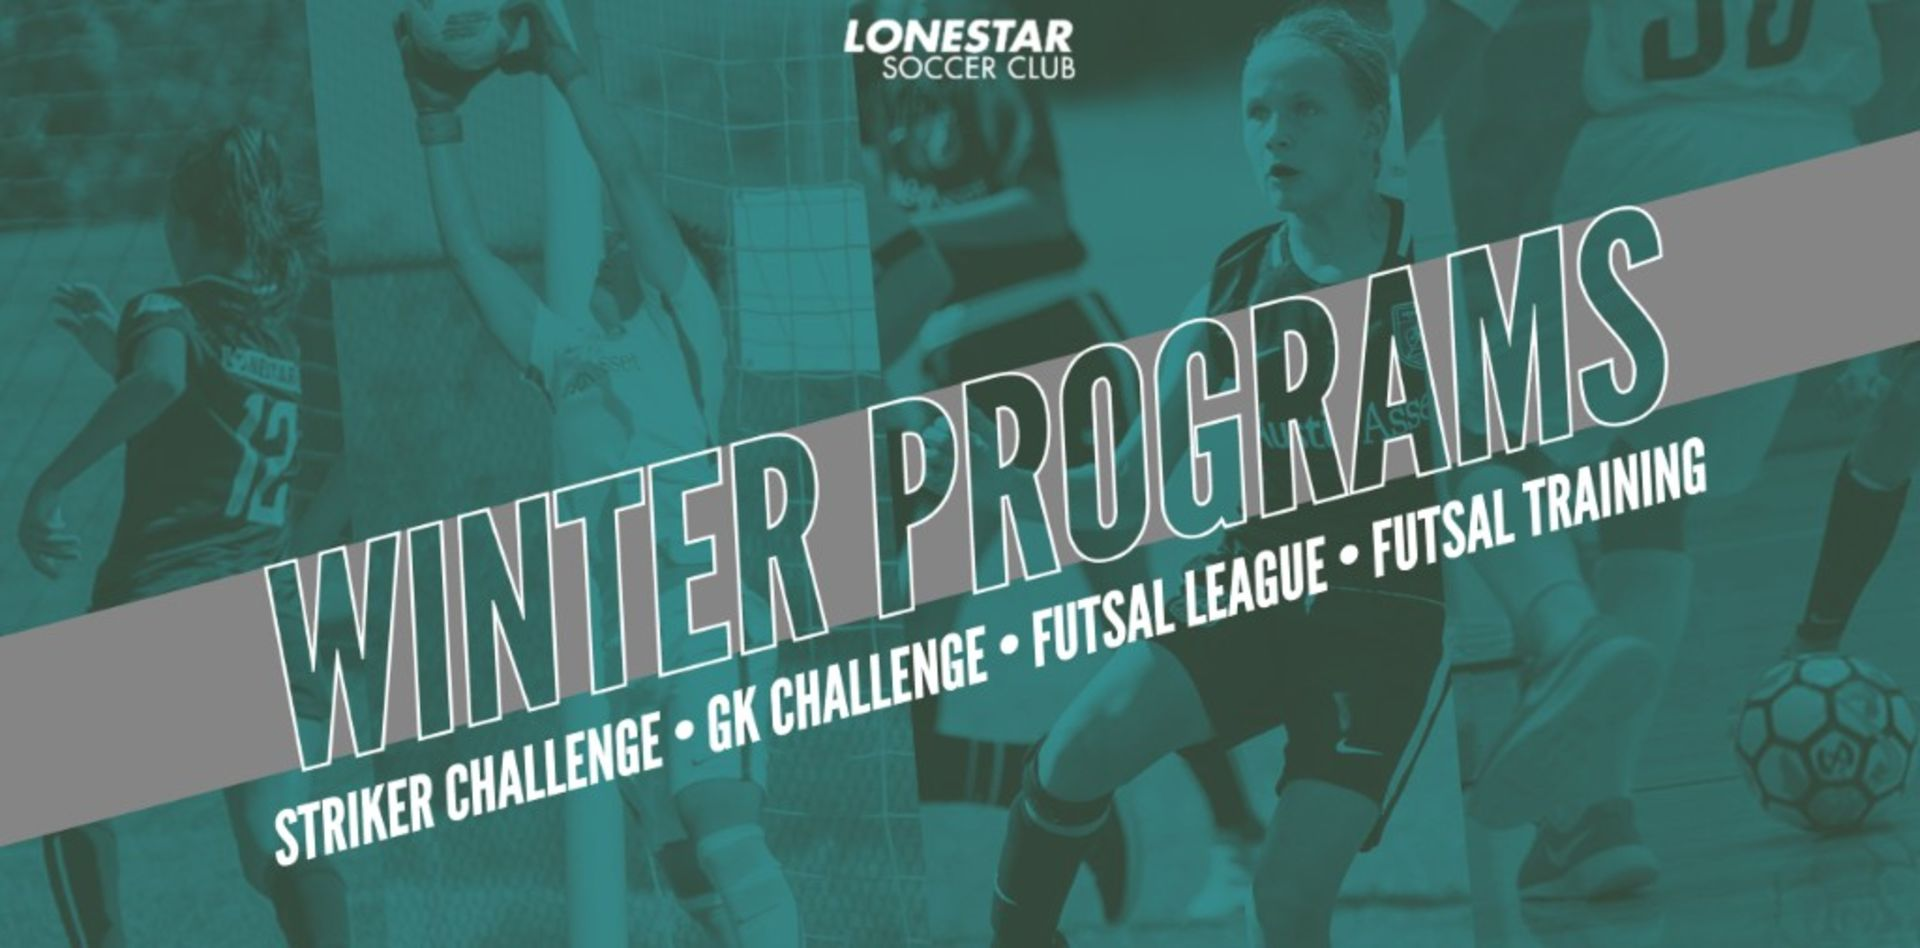 Winter Soccer Programs